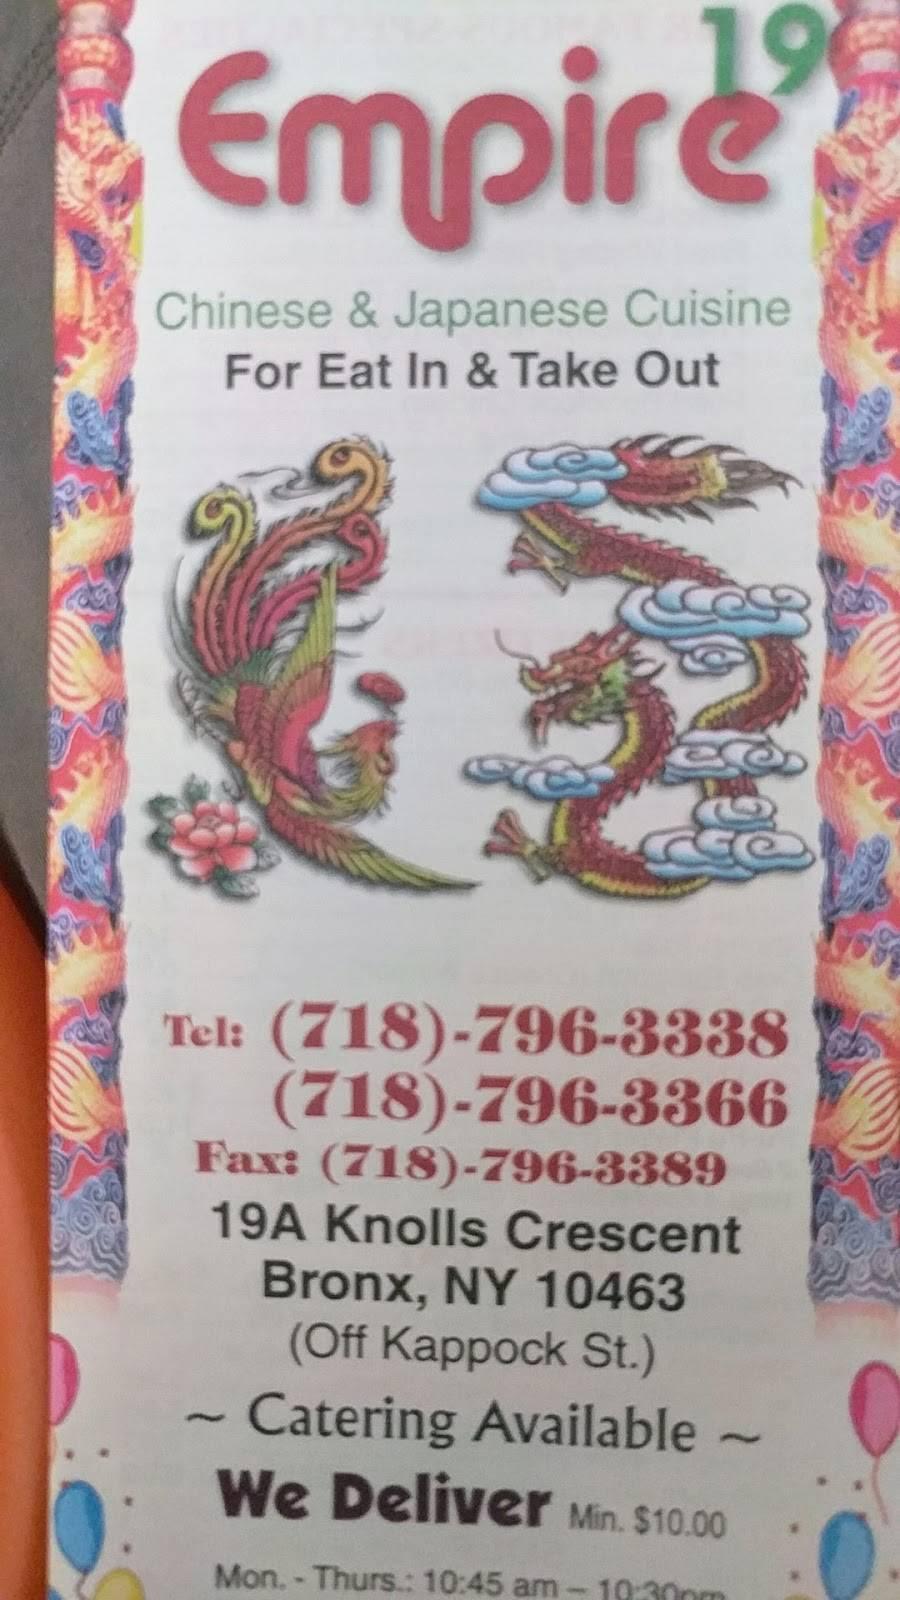 Empire 19 | restaurant | 19 Knolls Crescent, Bronx, NY 10463, USA | 7187963338 OR +1 718-796-3338